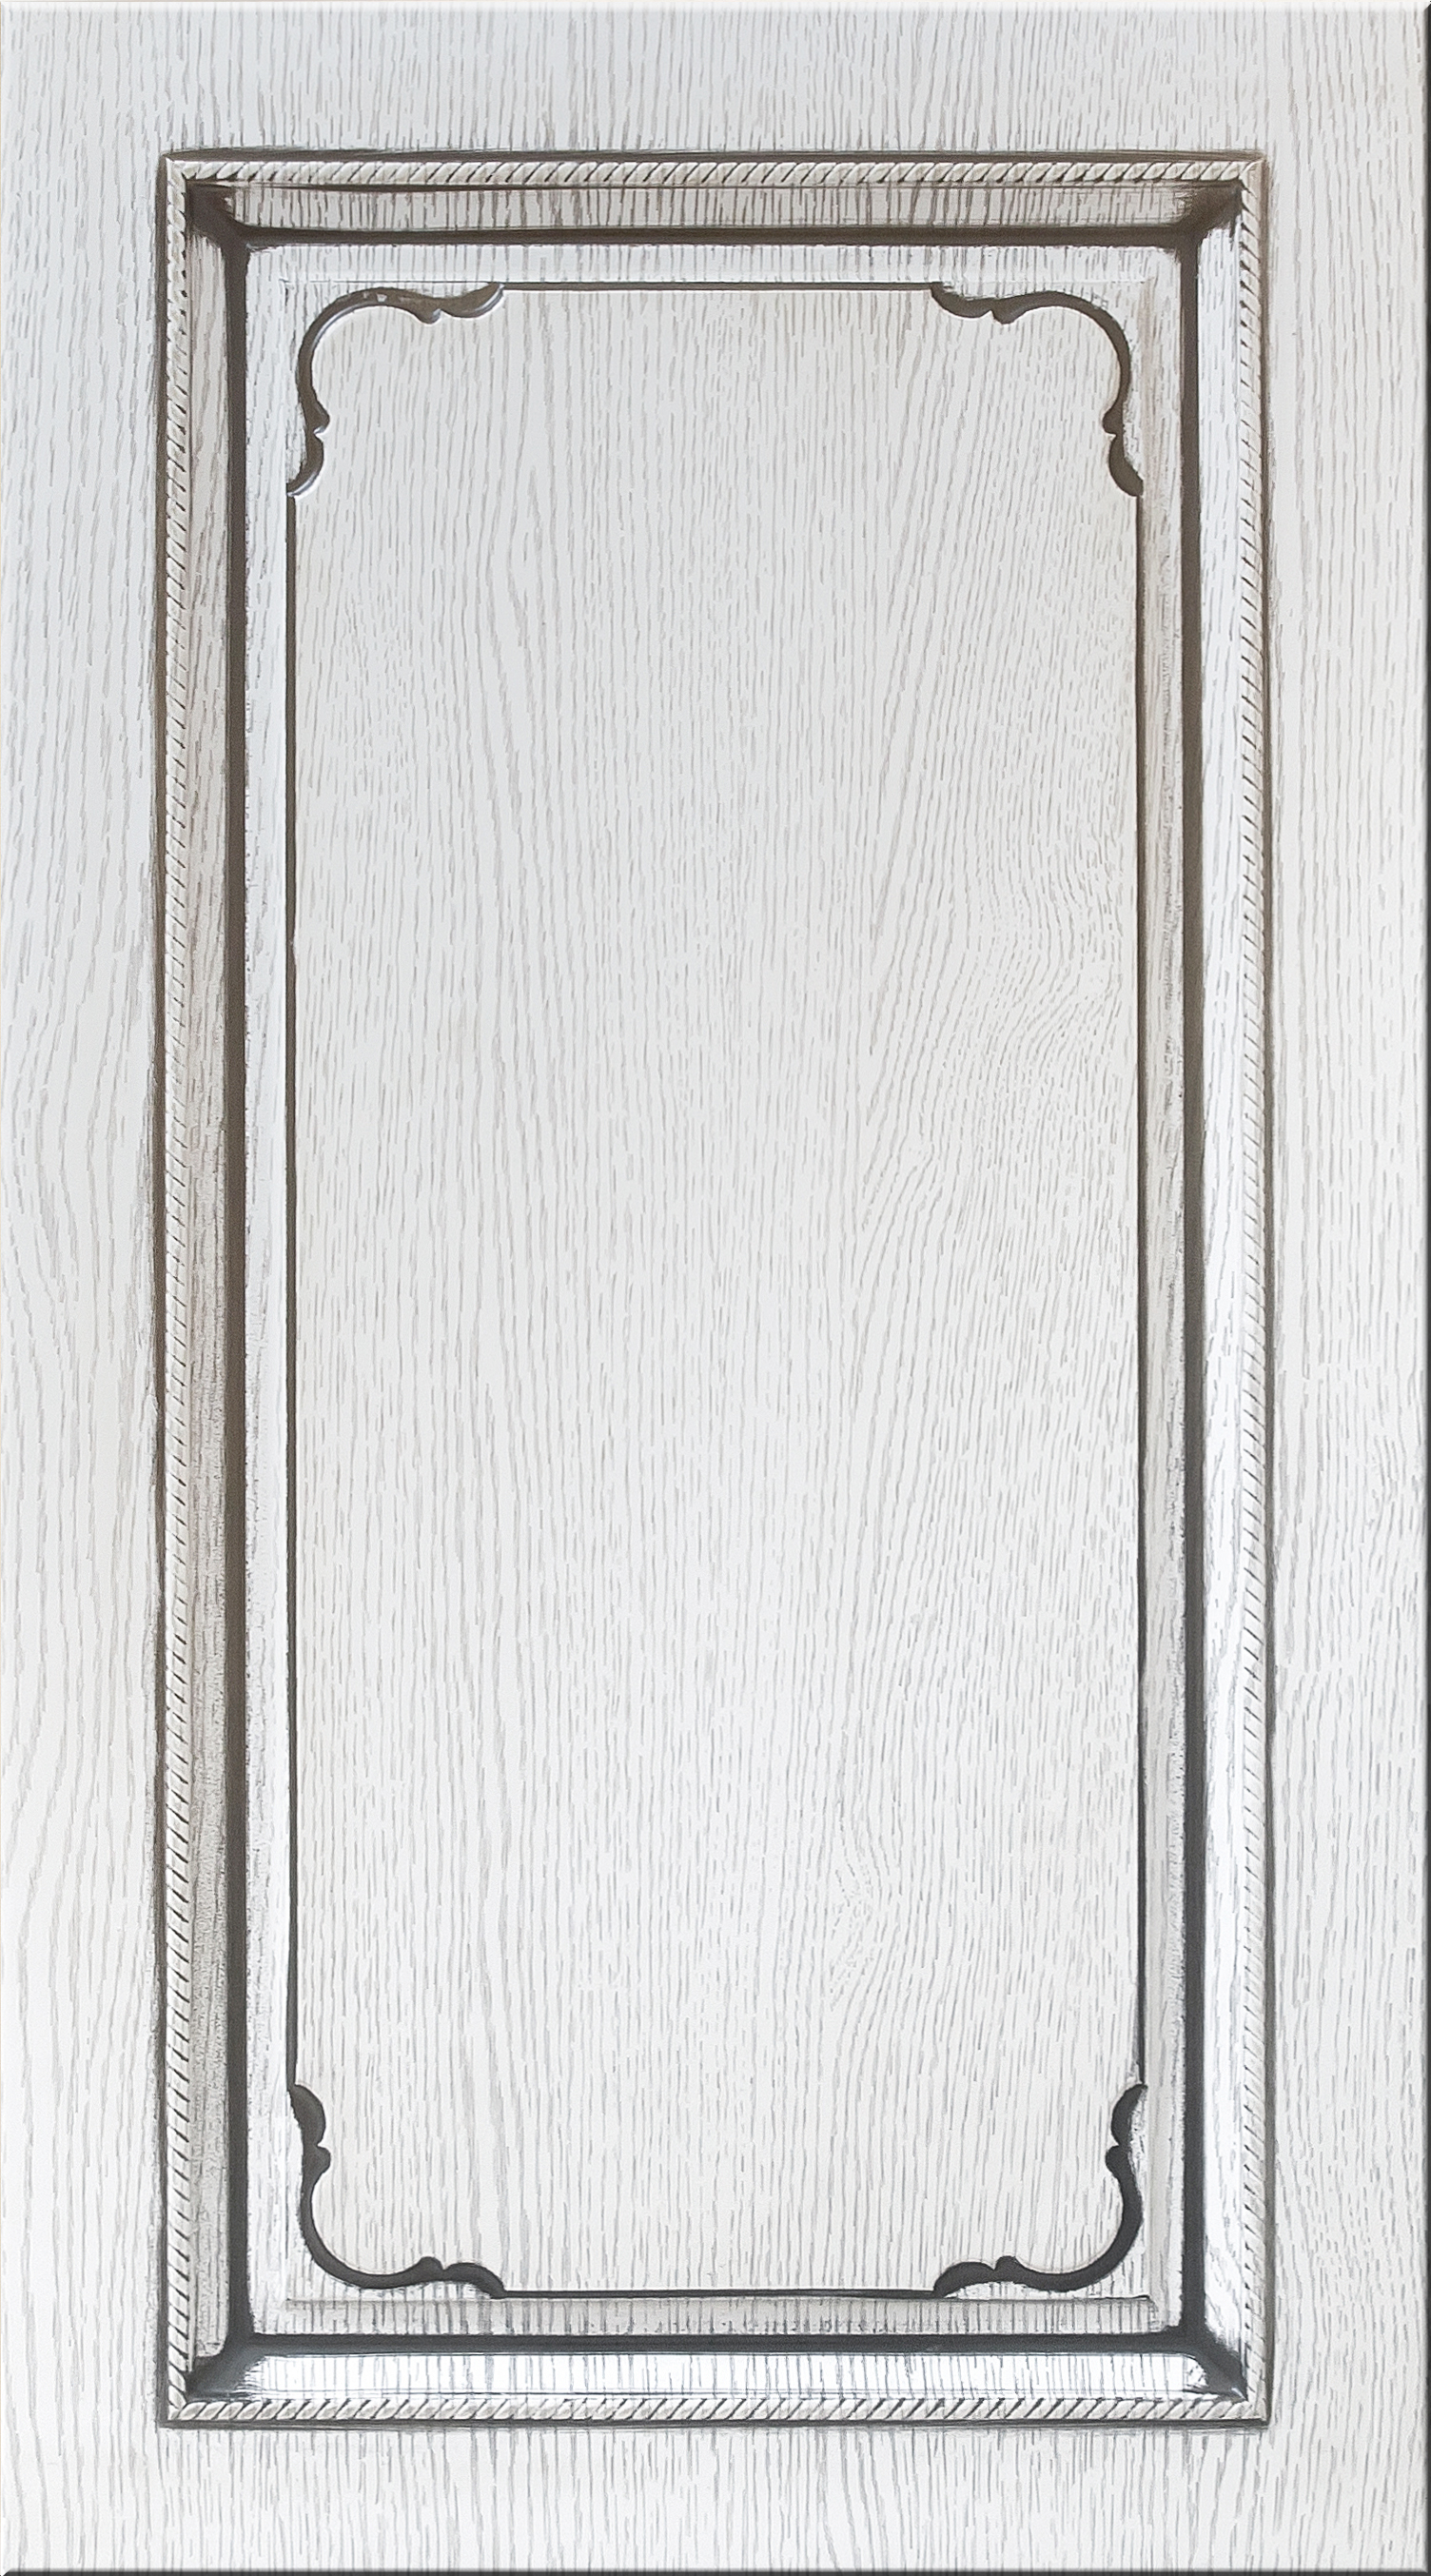 Фасады в пленке ПВХ, Фрезеровка № 54, цвет Патина премиум, патина - серебро